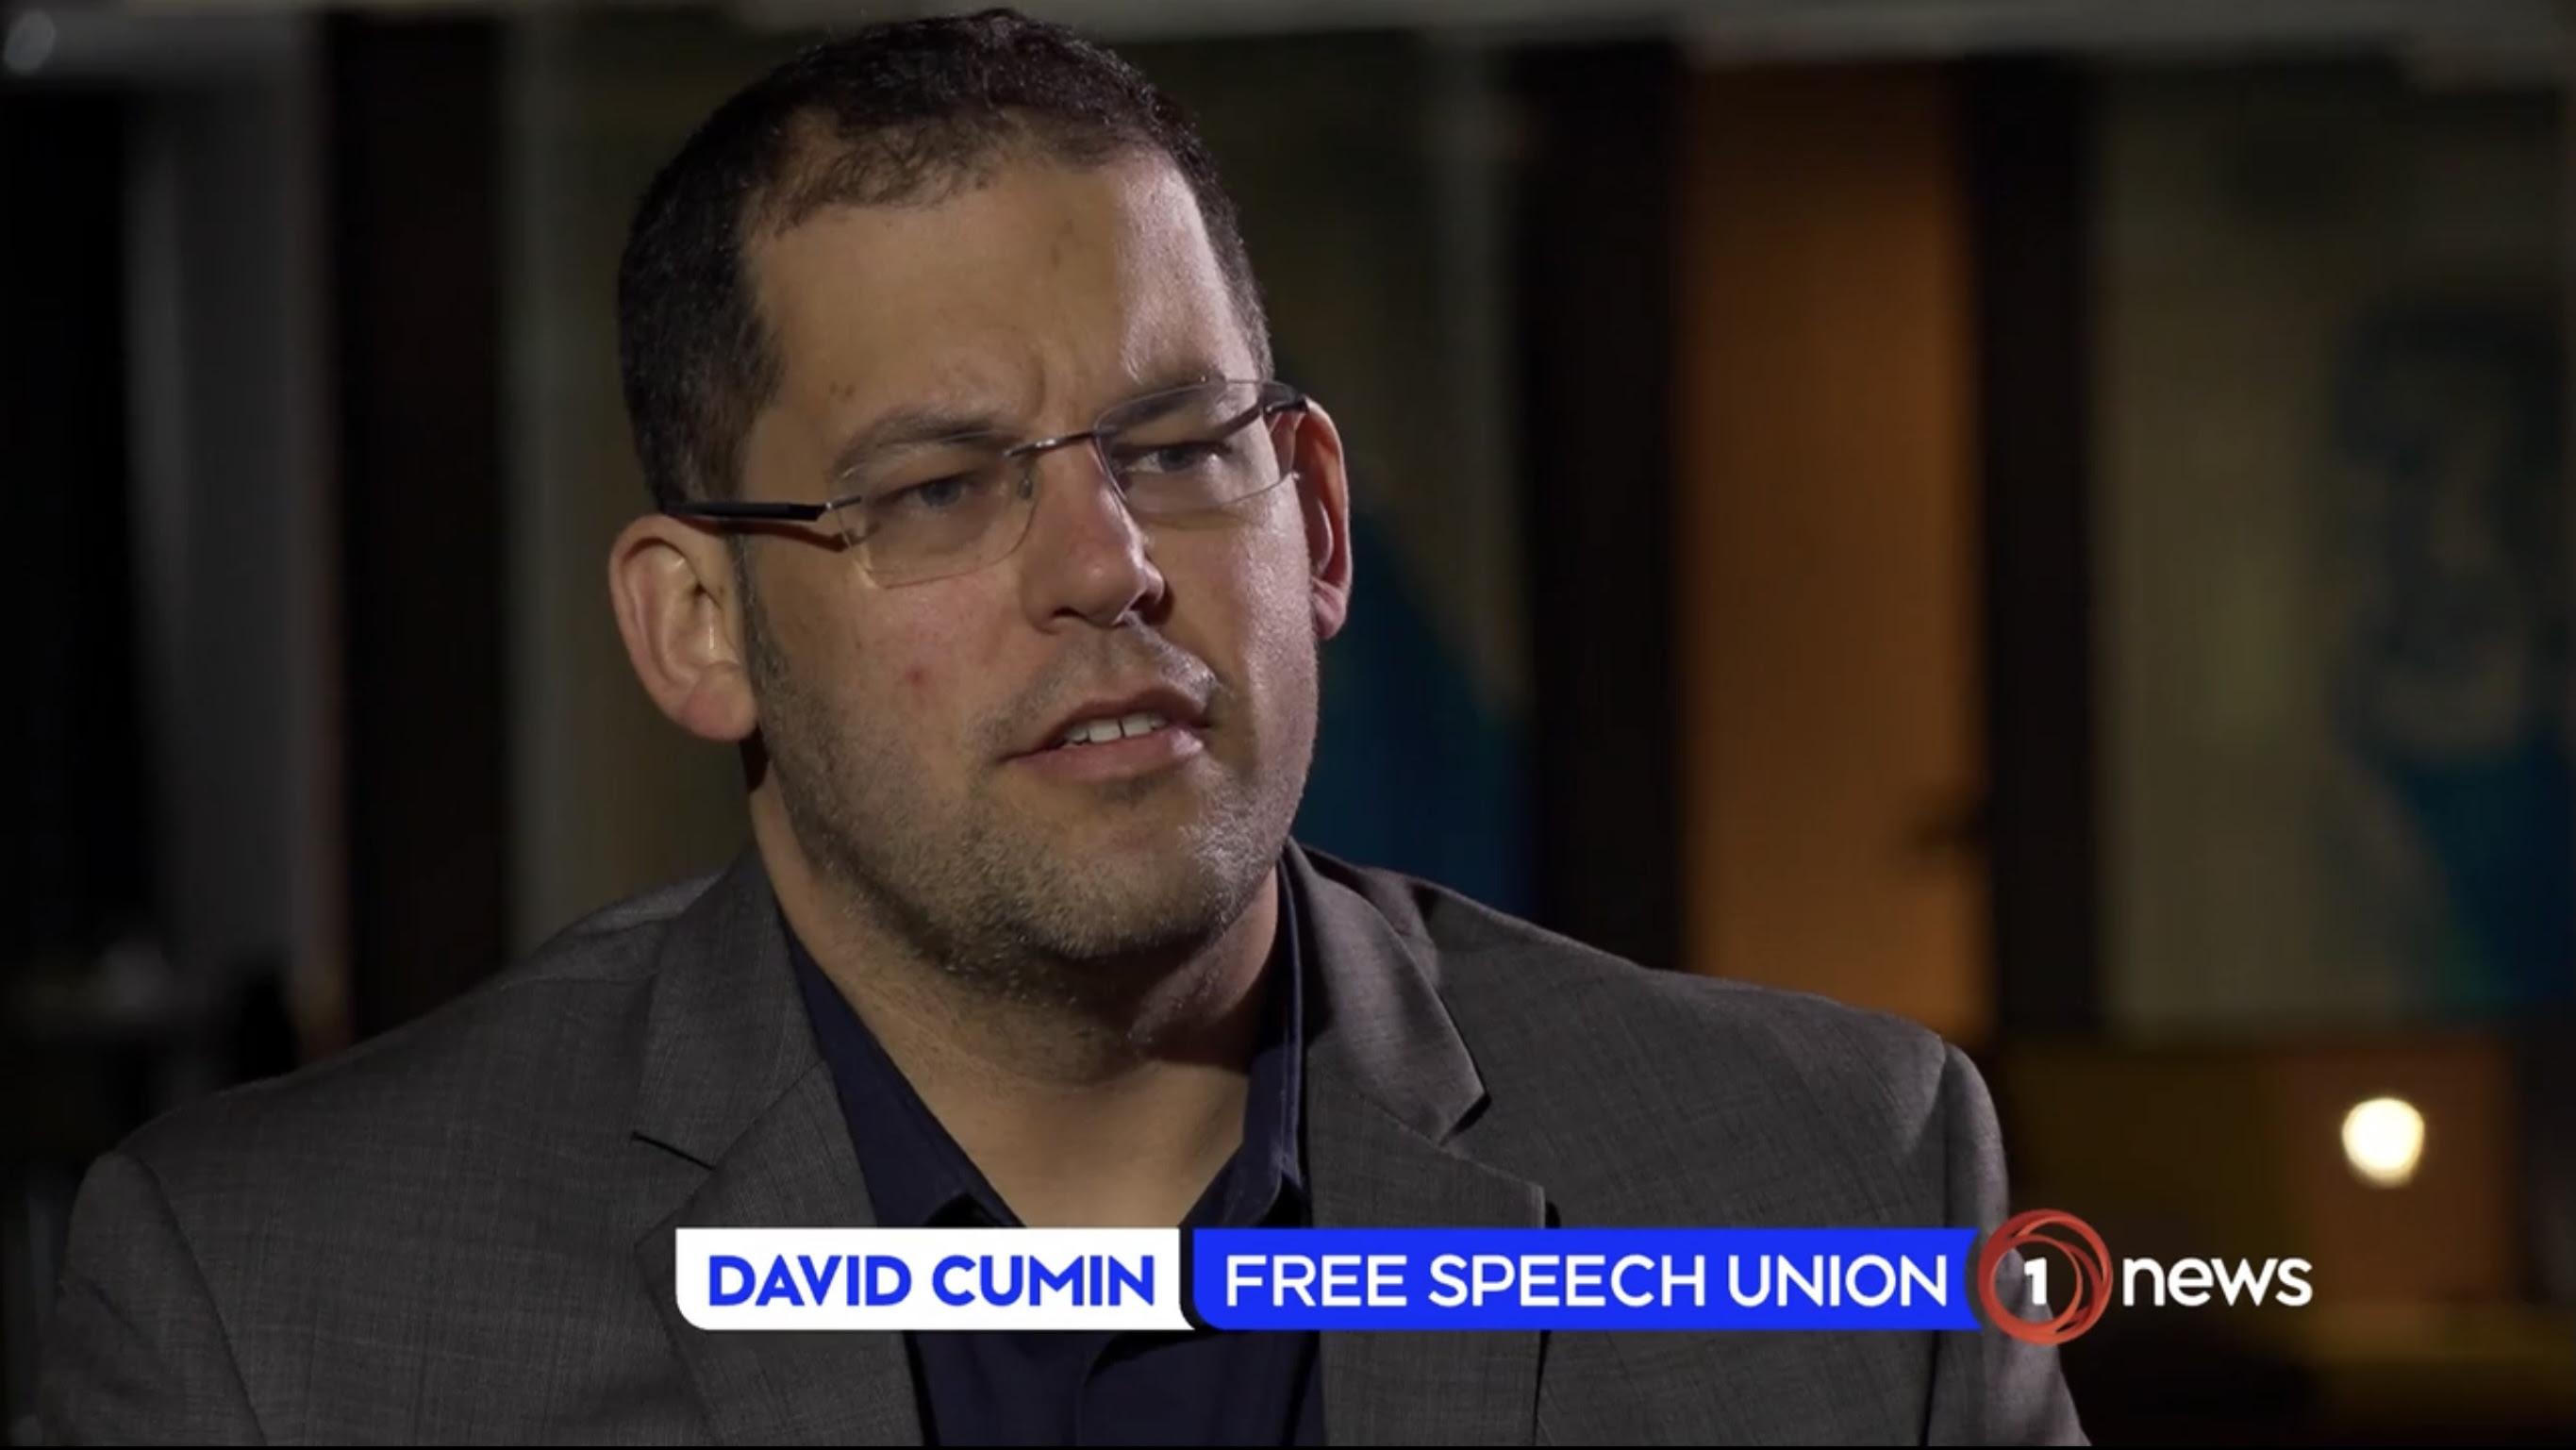 David Cumin on 1 News